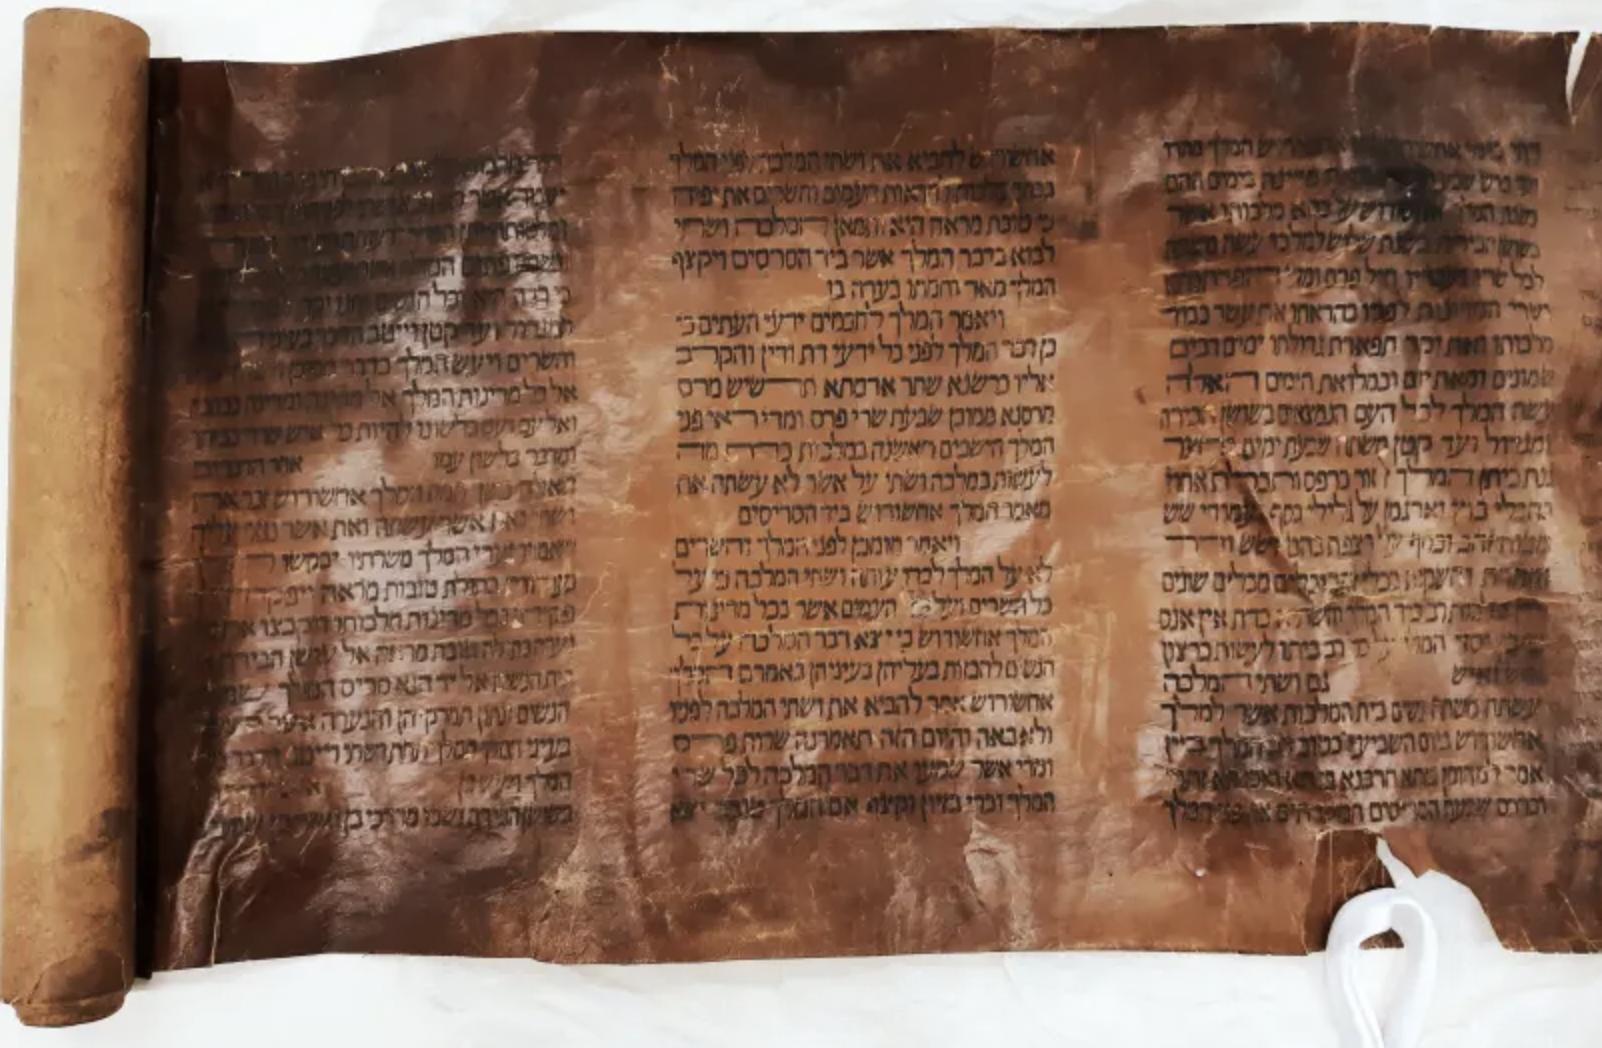 Raro manuscrito de Ester é doado a Livraria Nacional de Israel